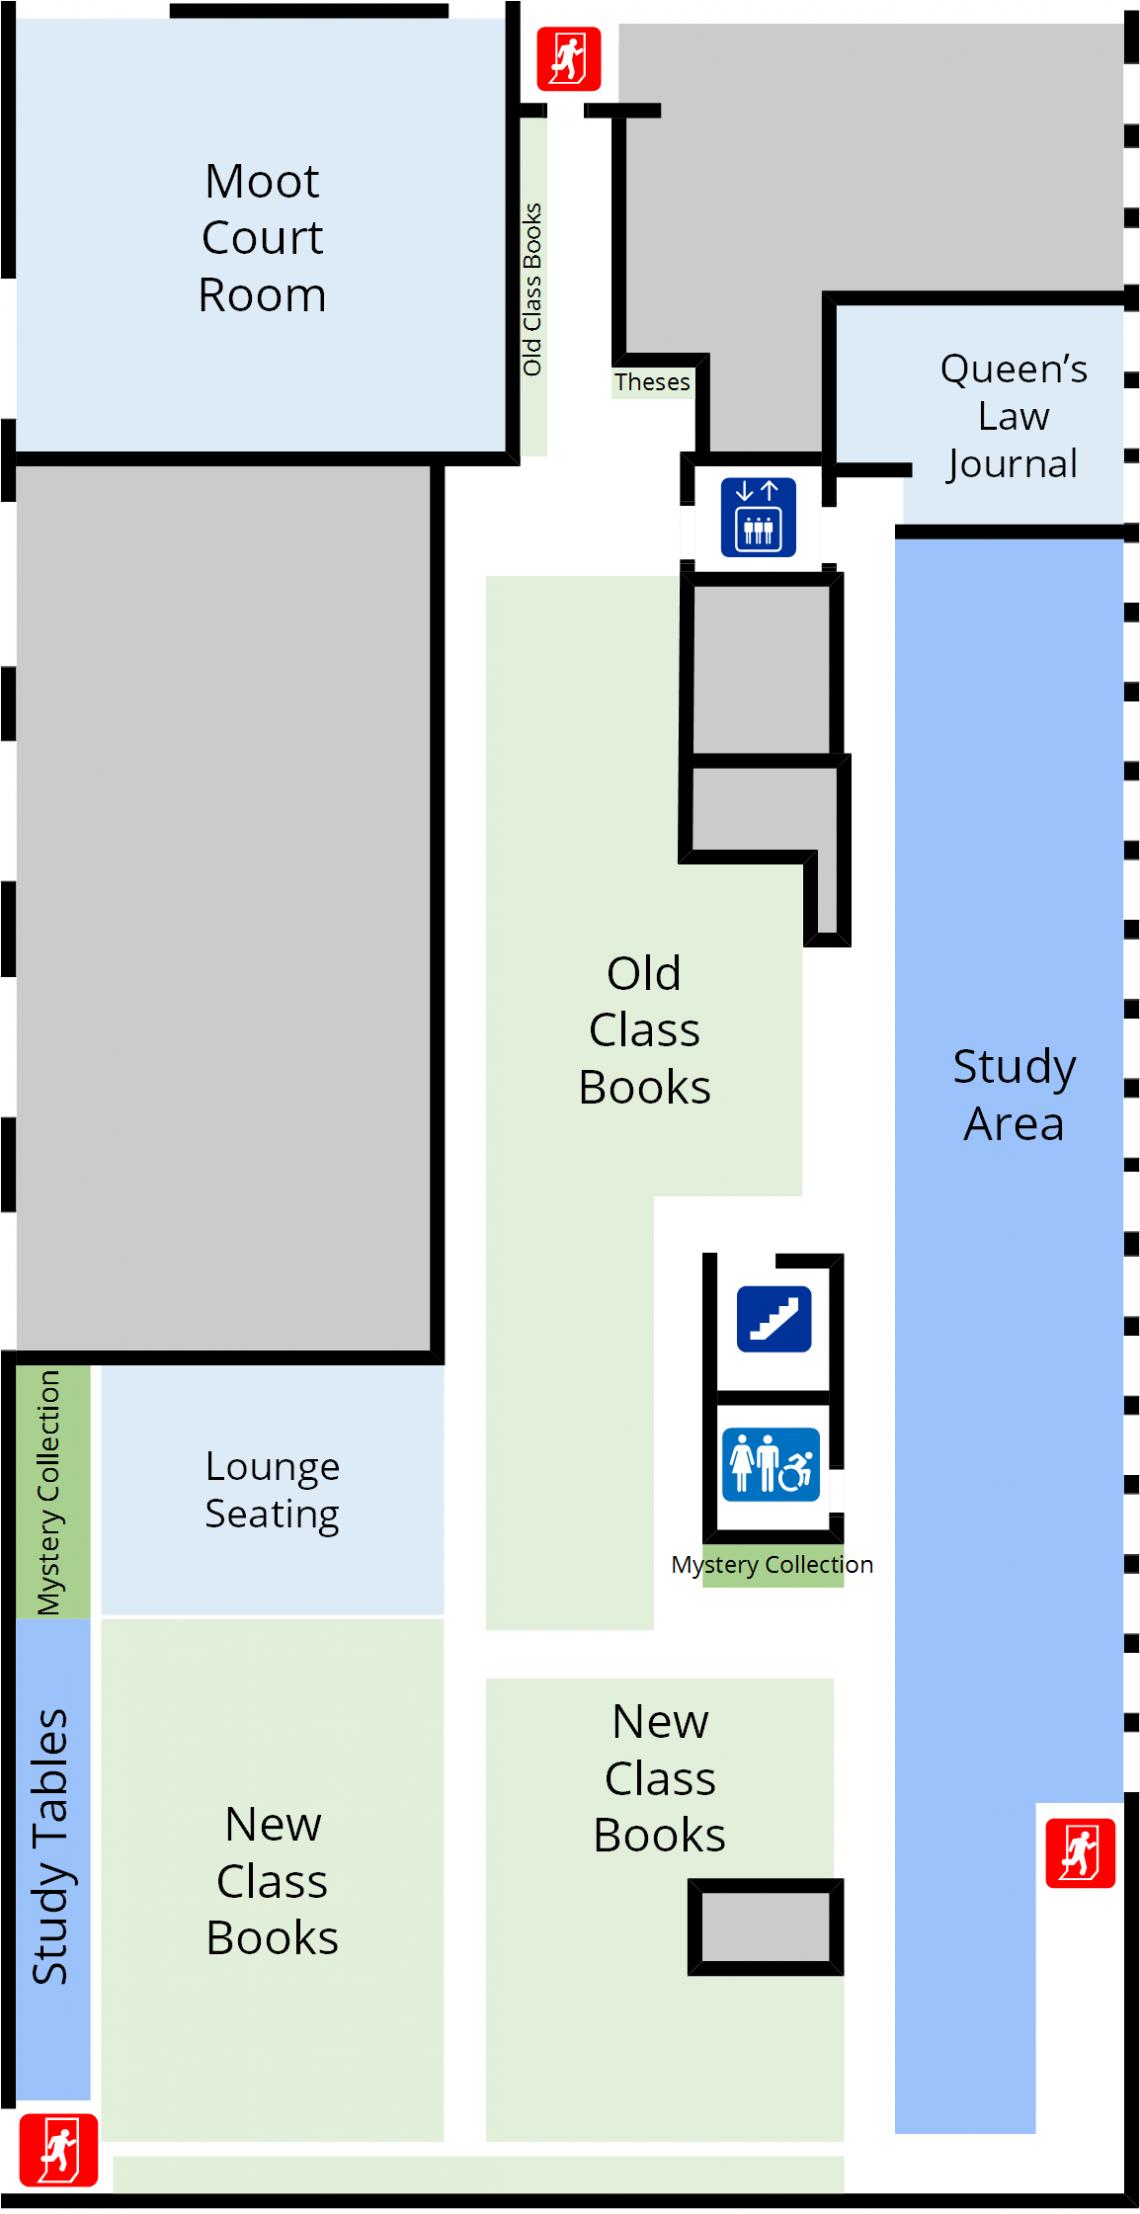 Lederman Law Library Second Floor Floorplan